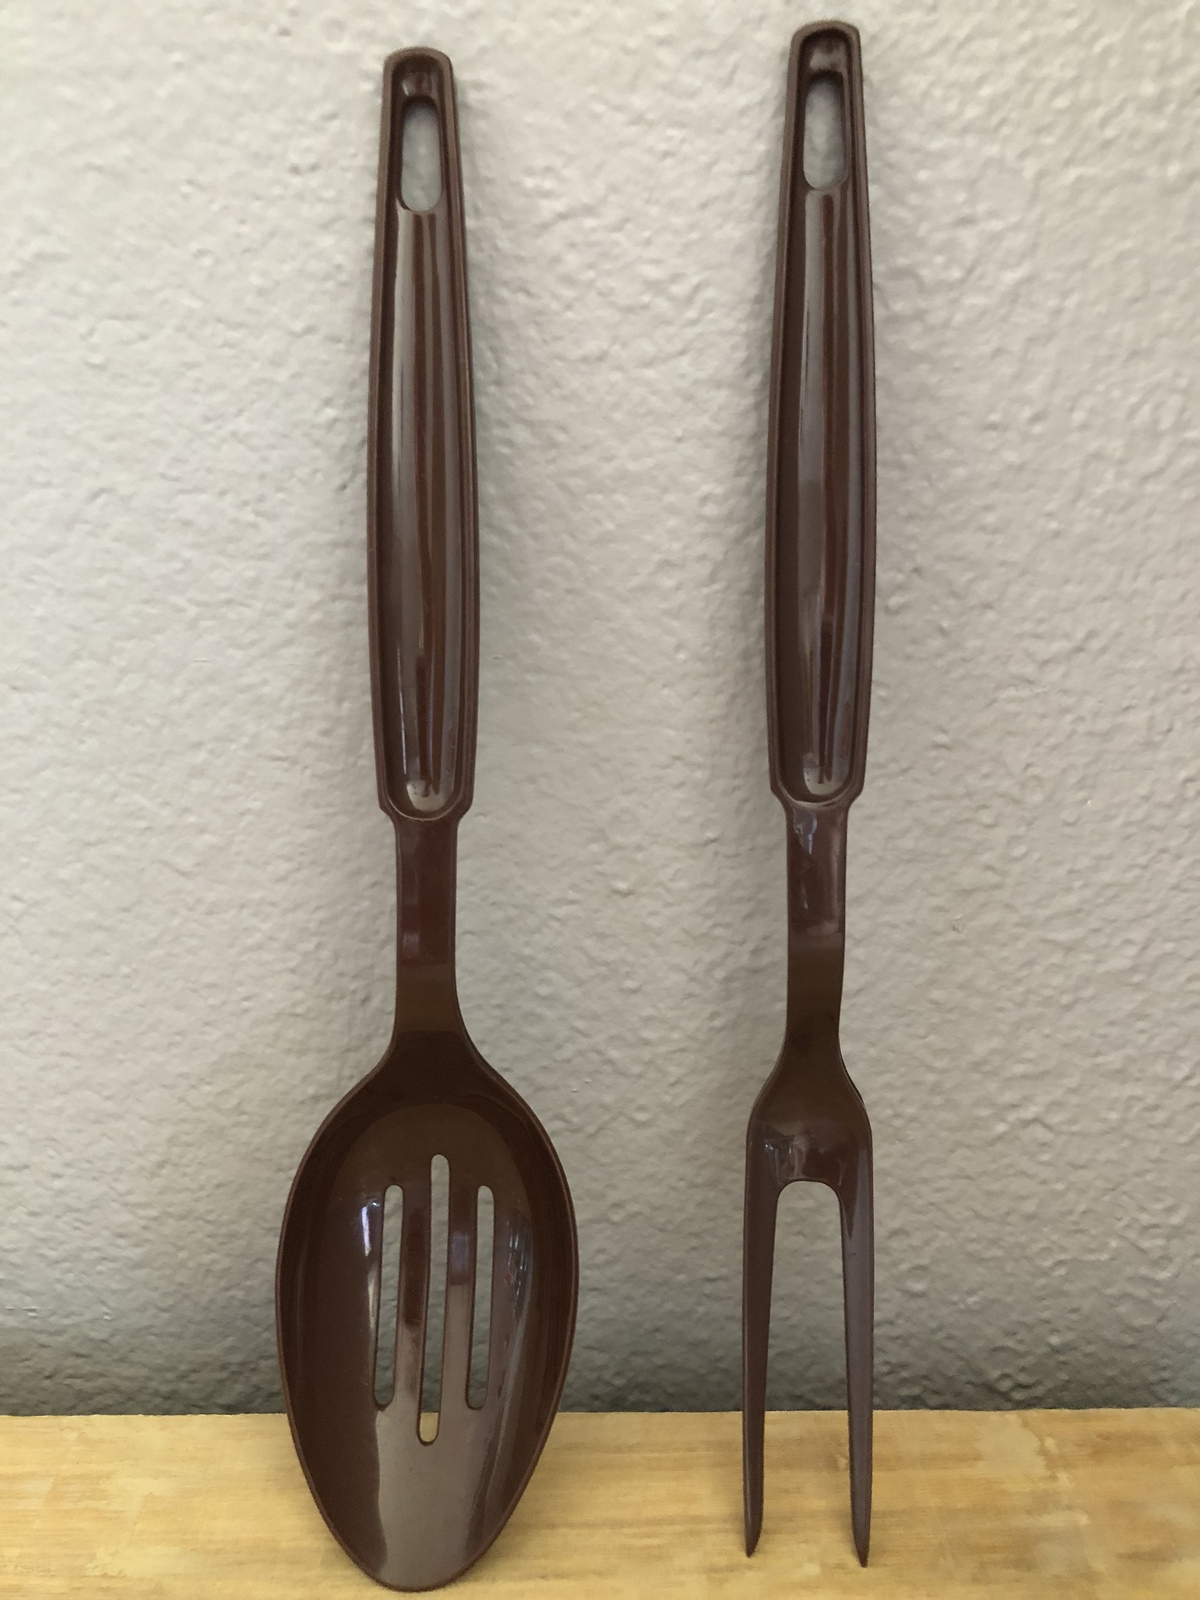 EKCO Vintage Brown Nylon Slotted Spoon & Serving Fork